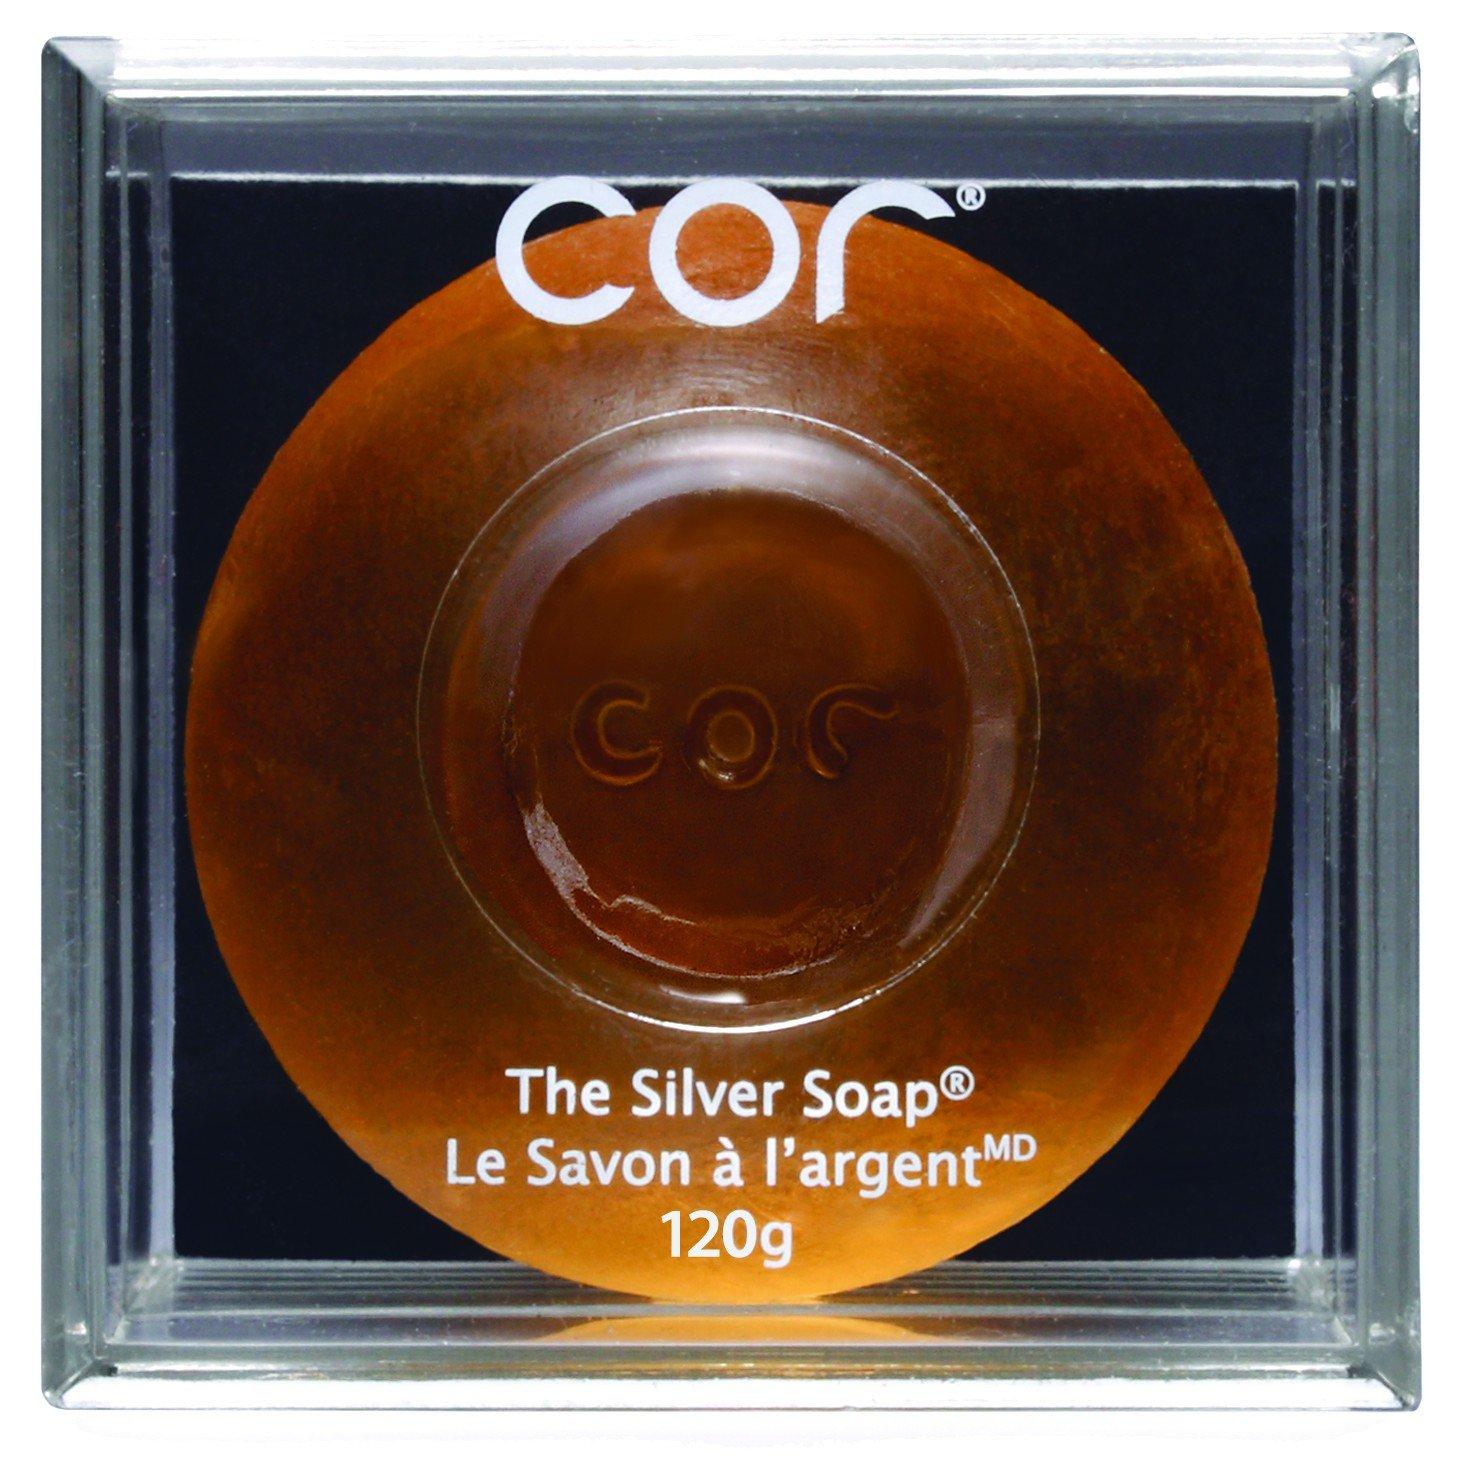 cor_103_the_silver_soap_120g_bar_hires 2/9